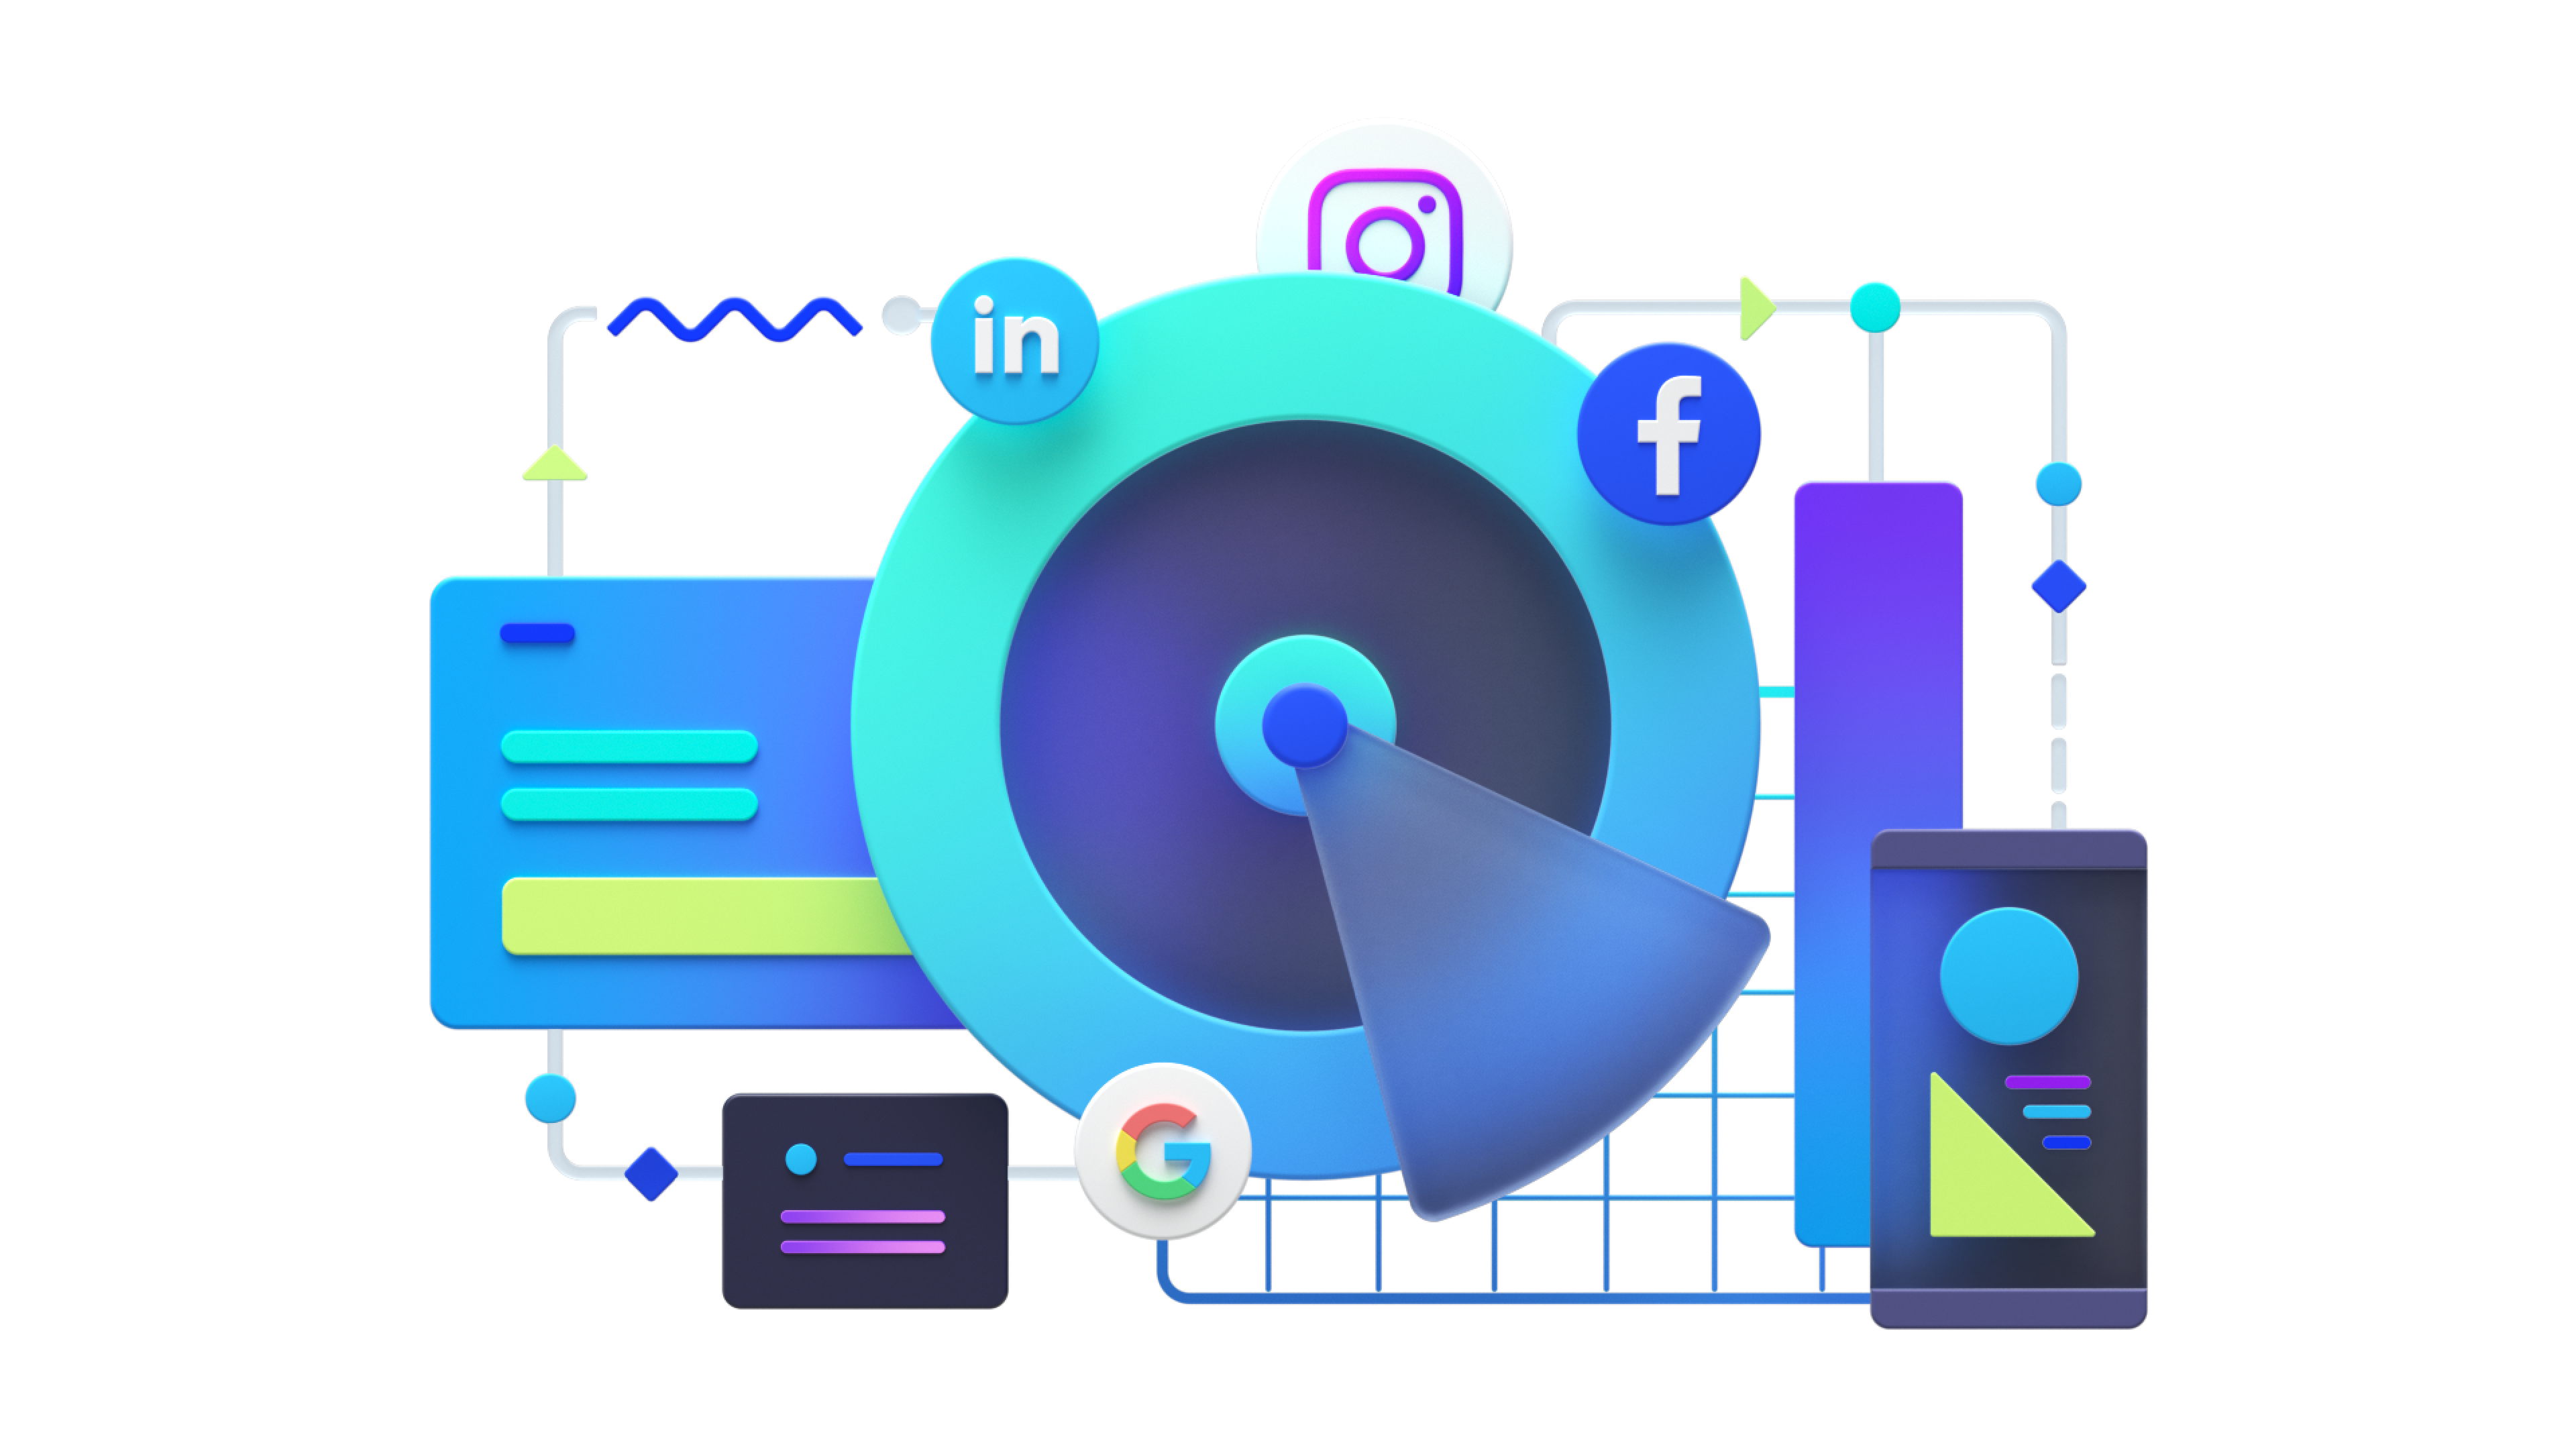 Colorful illustration showcasing Range's digital marketing services